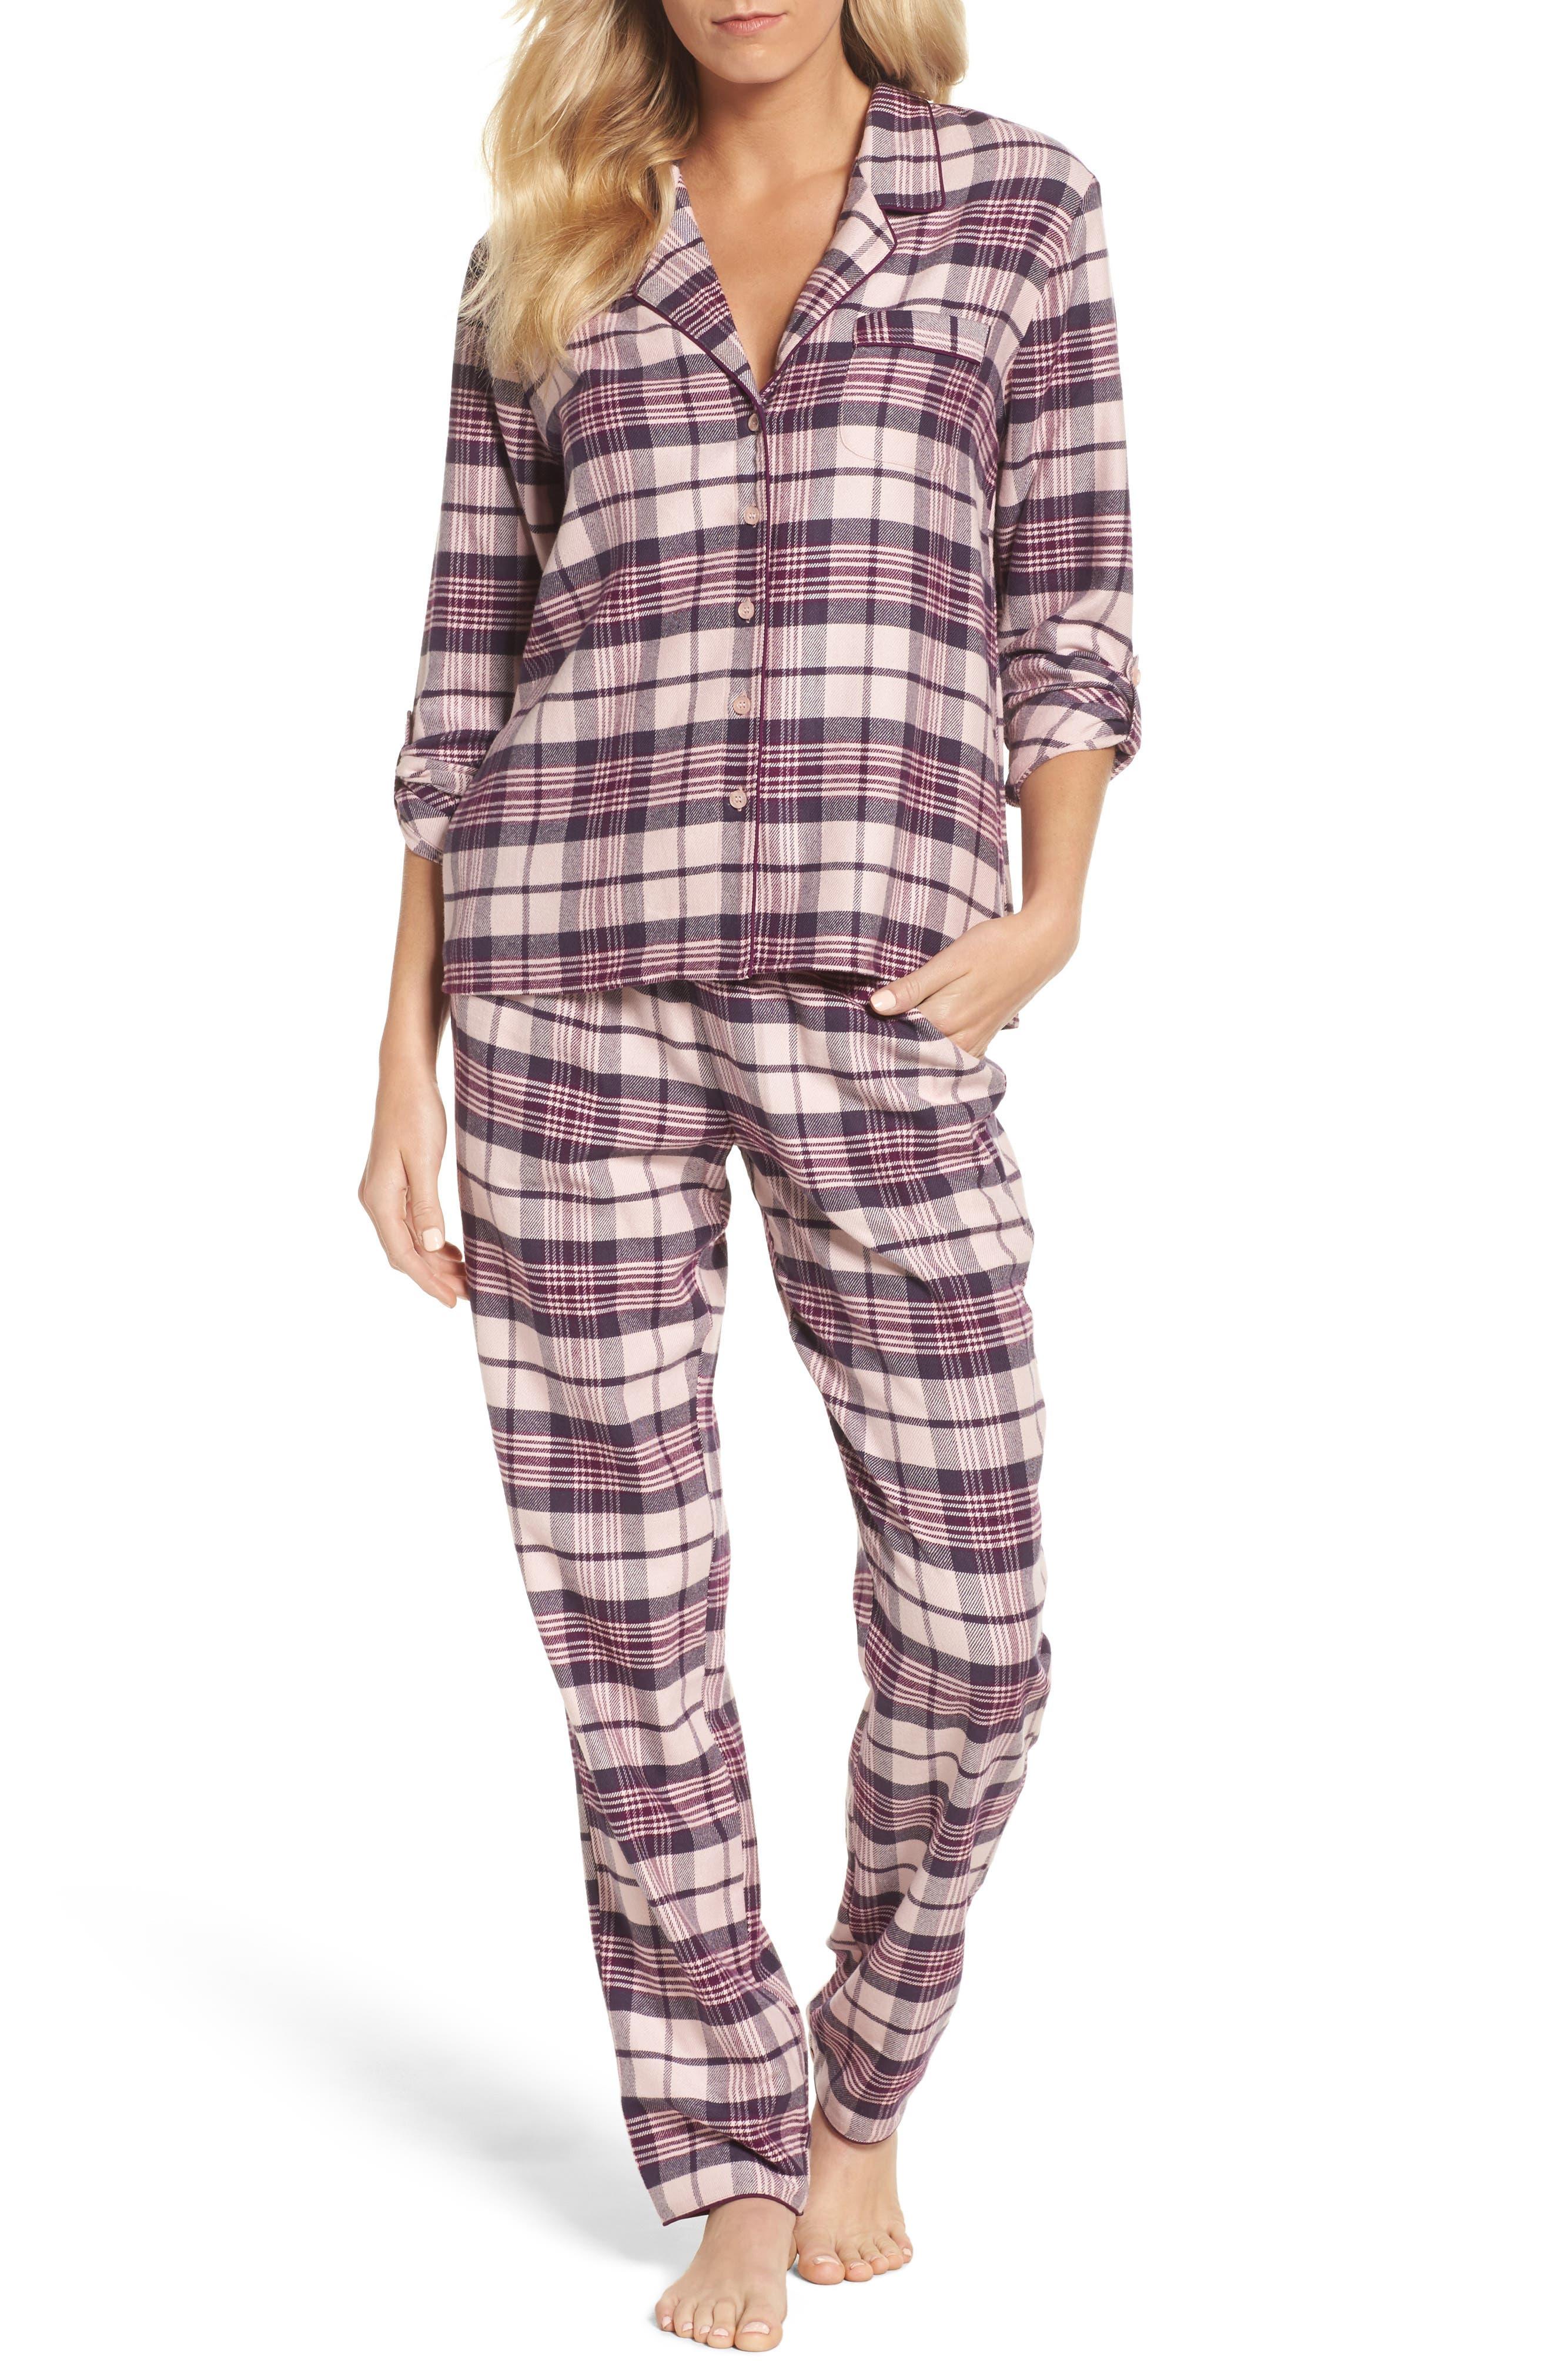 Lingerie Starlight Flannel Pajamas,                             Main thumbnail 1, color,                             Pink Peony Bud Tonal Tartan